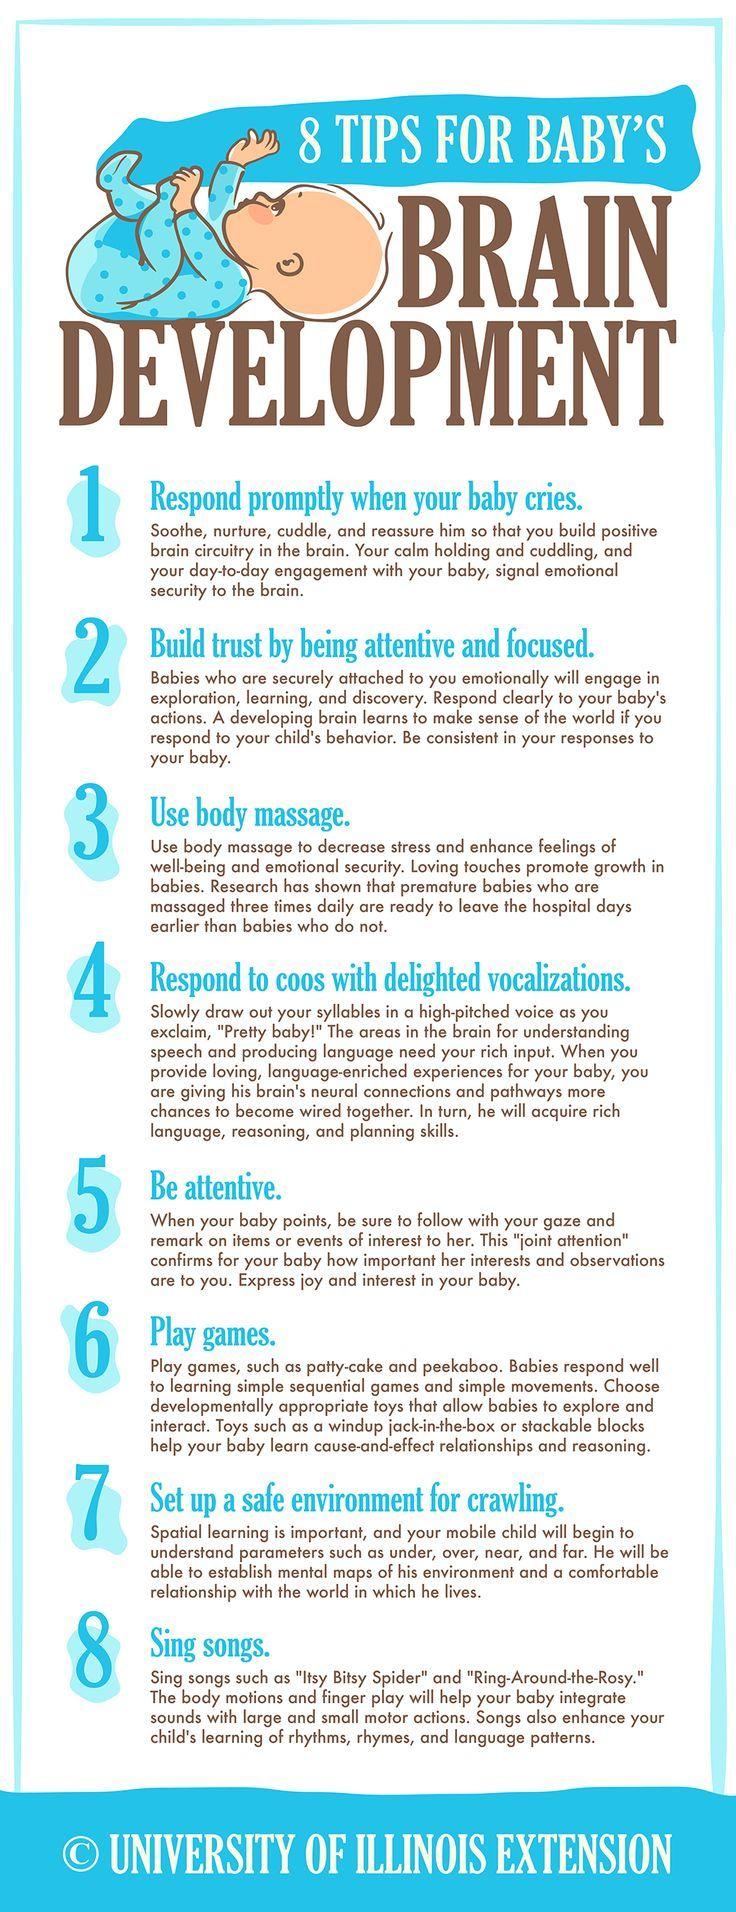 8 Tips for Baby's Brain Development #health